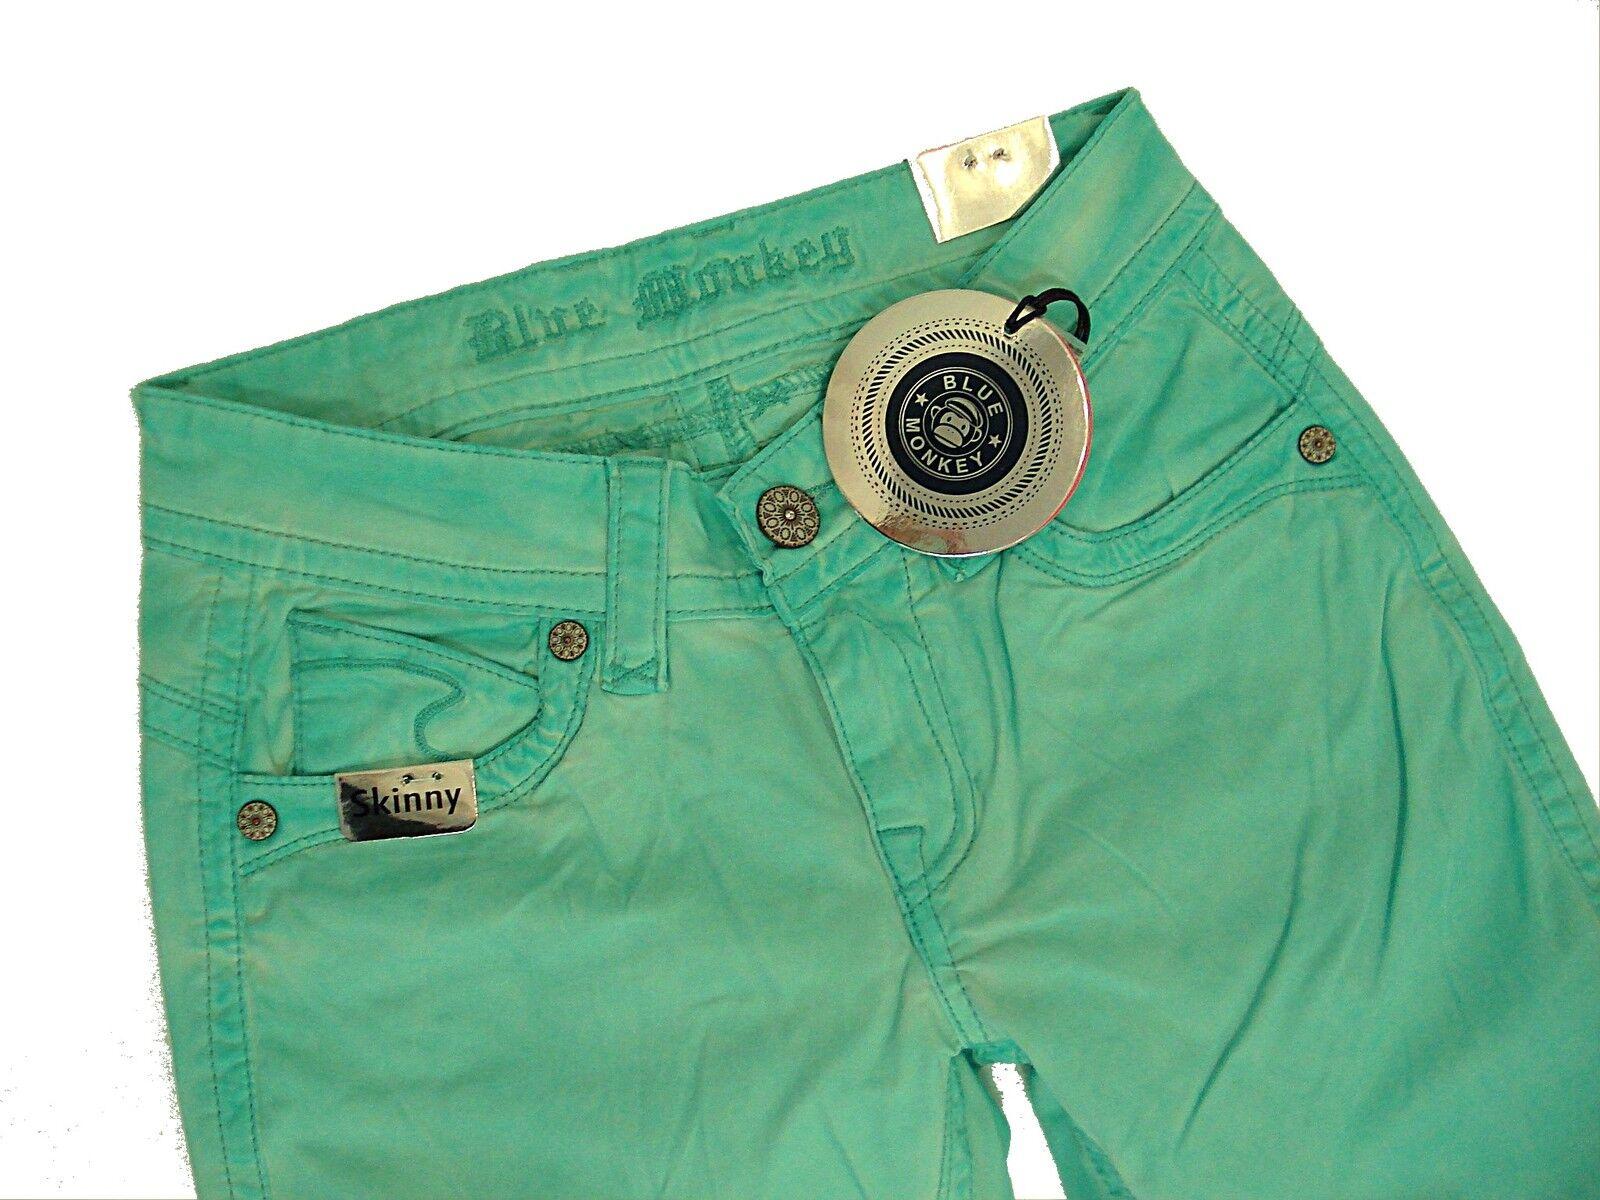 Blau MONKEY  Jeans  LAURA BM3495  Gr. 25 26 27 28 29 30 31  L32   Röhre Skinny